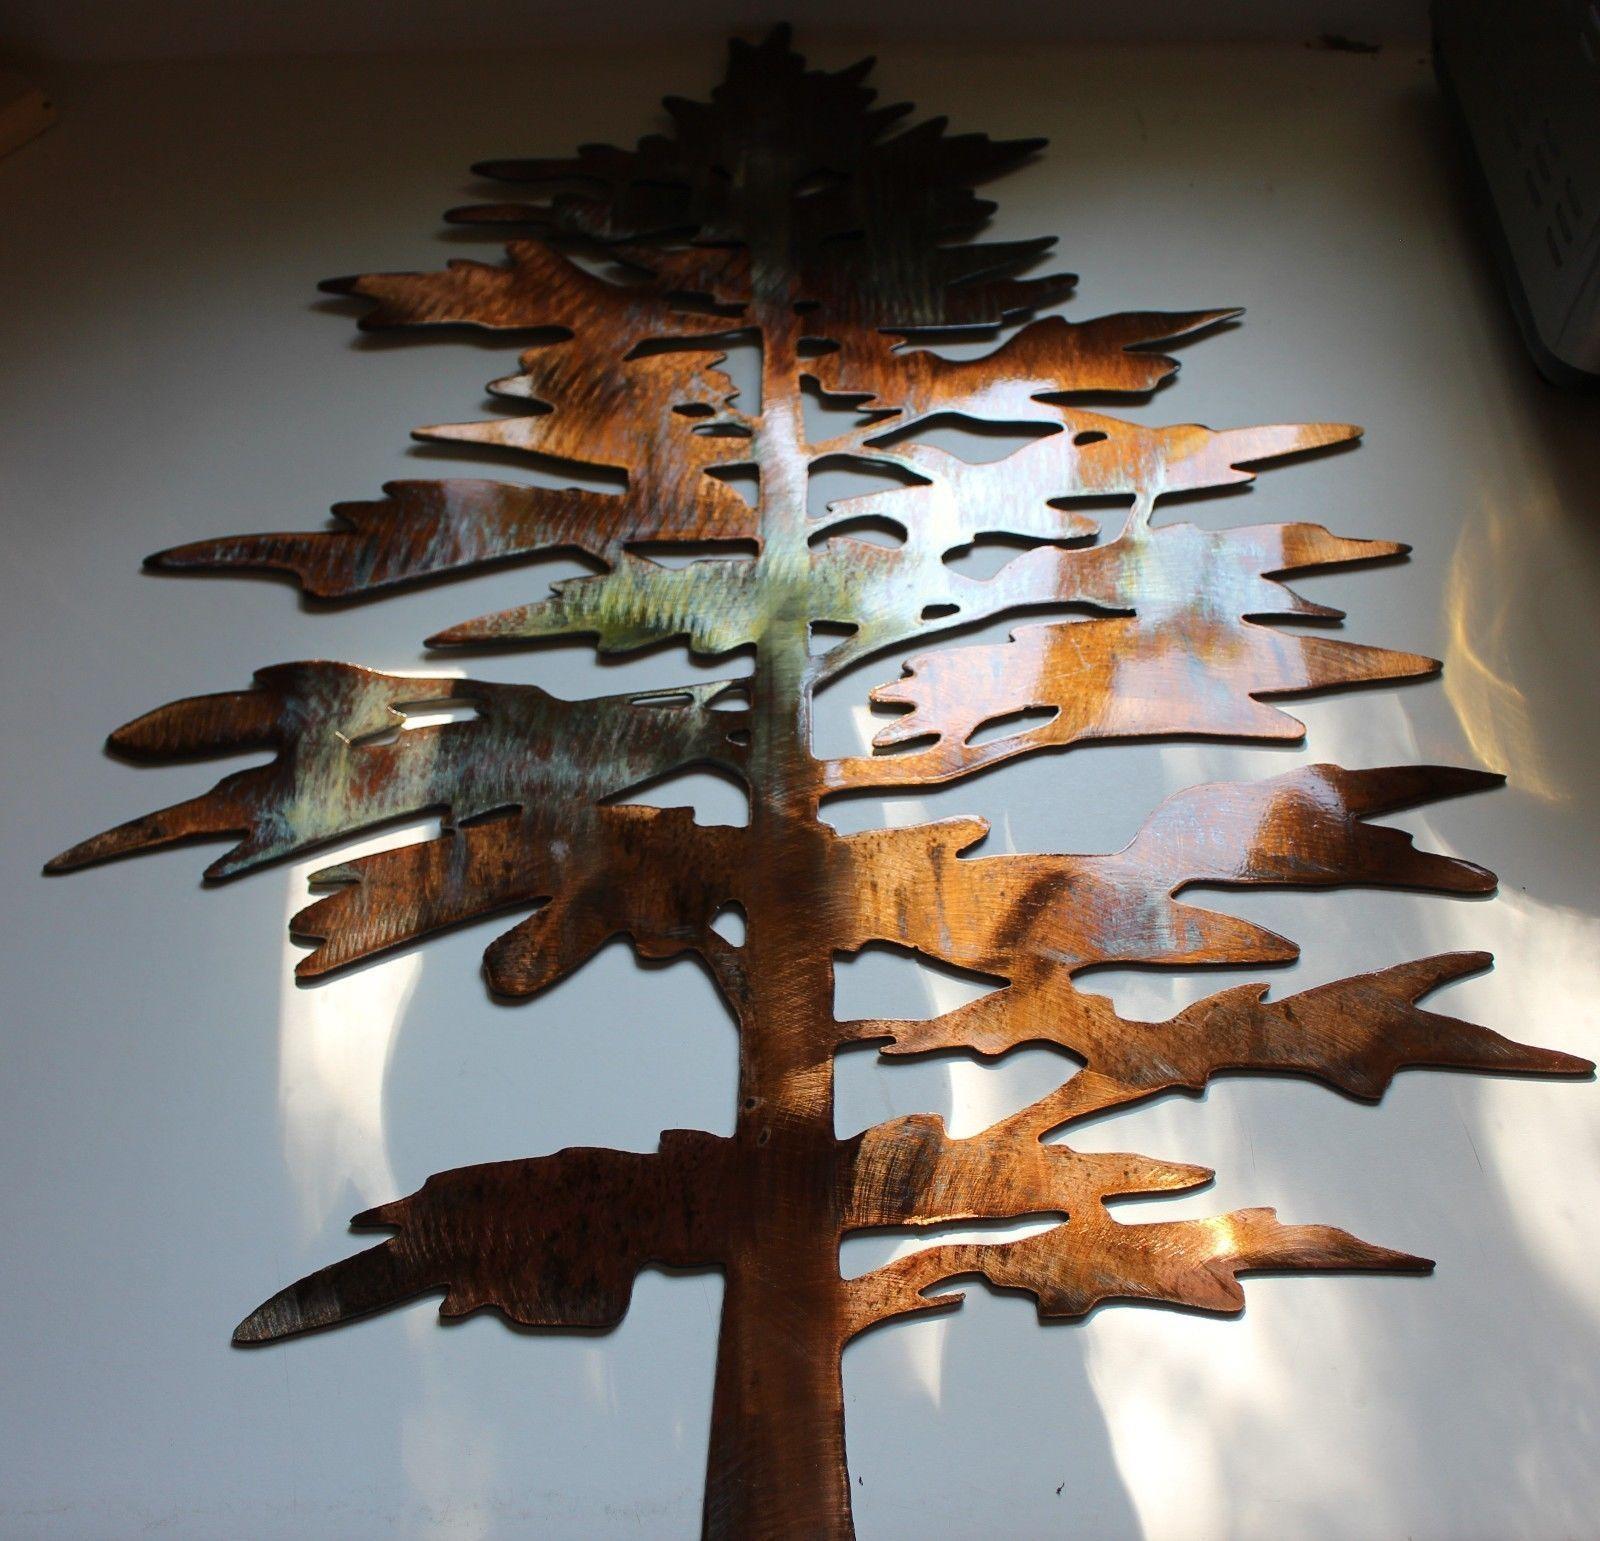 Majestic Fat Pine Tree Metal Wall Art Decor • $ (Image 4 of 20)